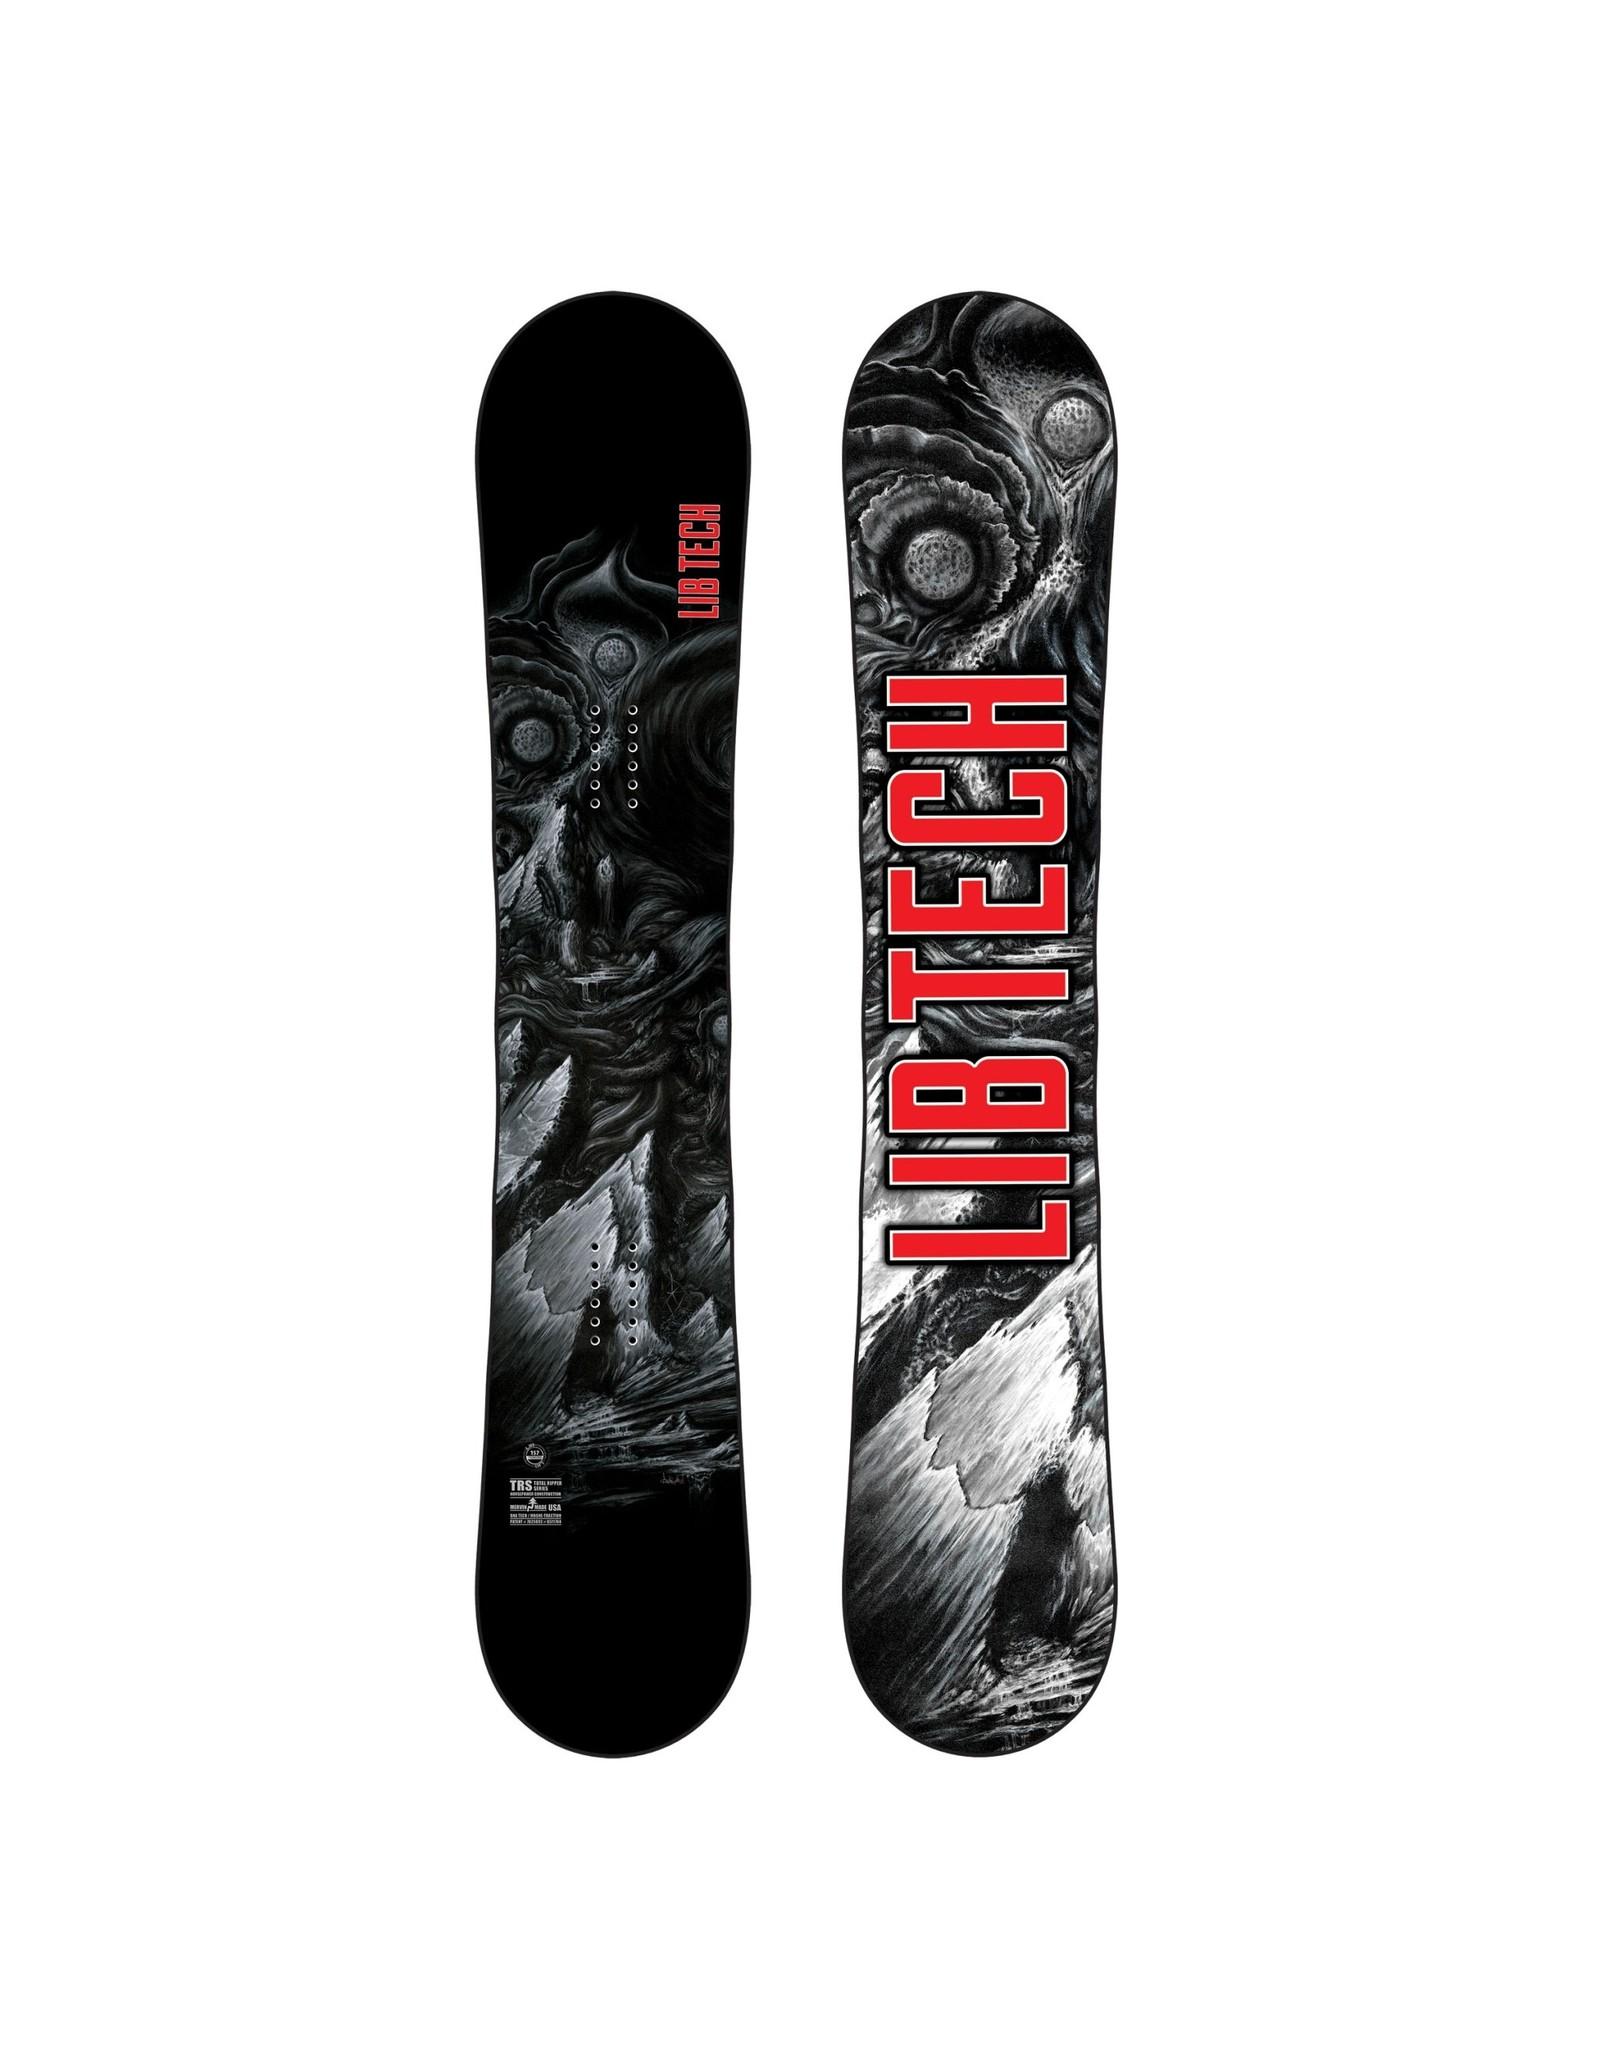 lib technologies Lib technologies - snowboard HP C2